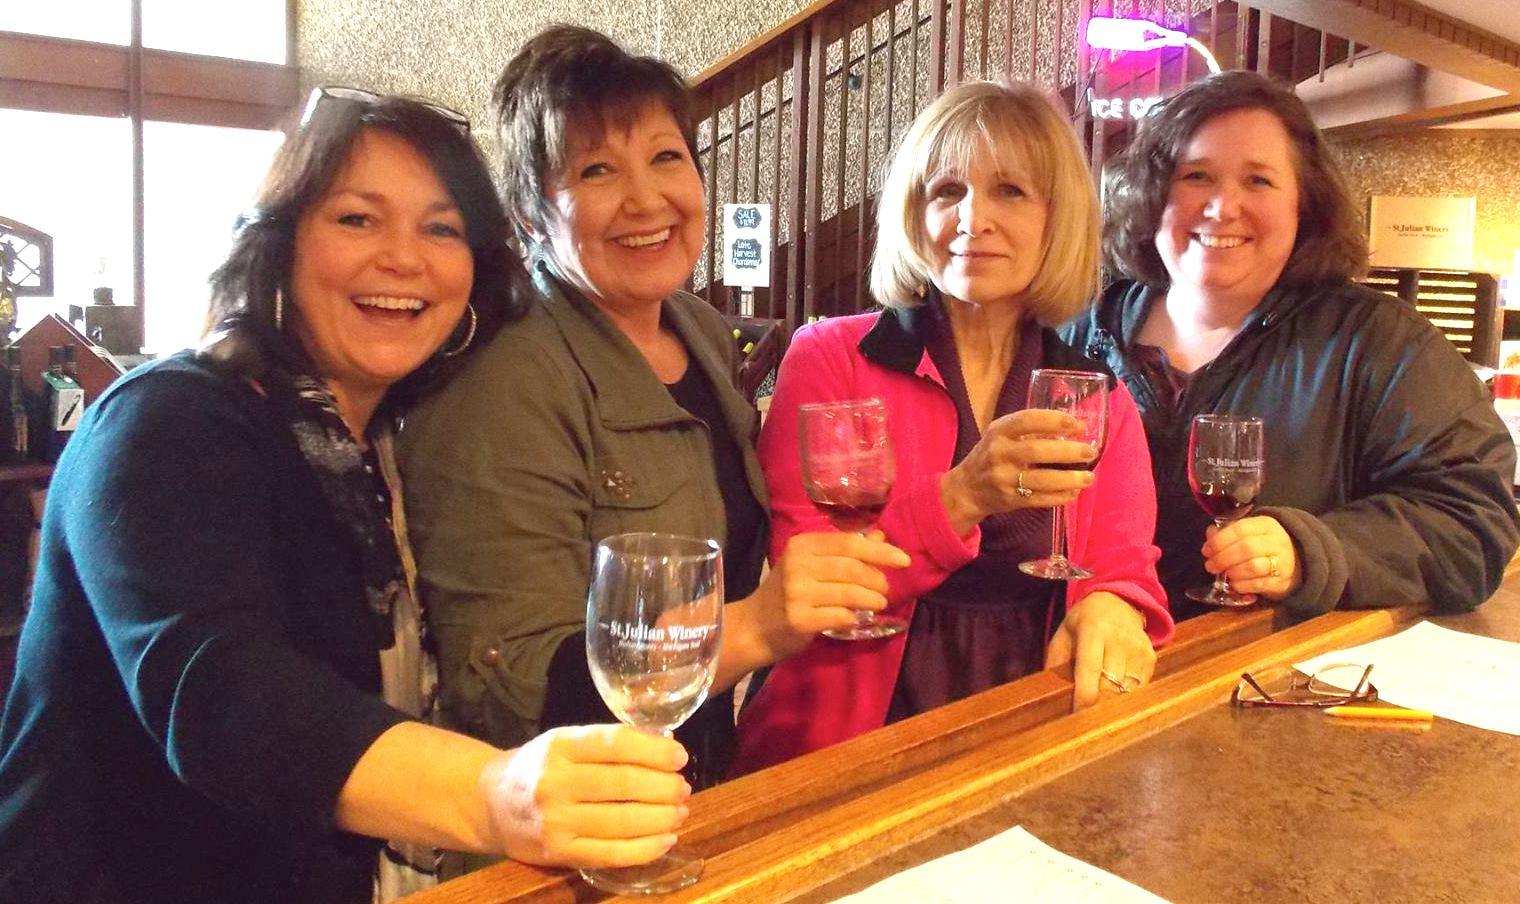 Girls at winery Michigan Feb 2016 copy